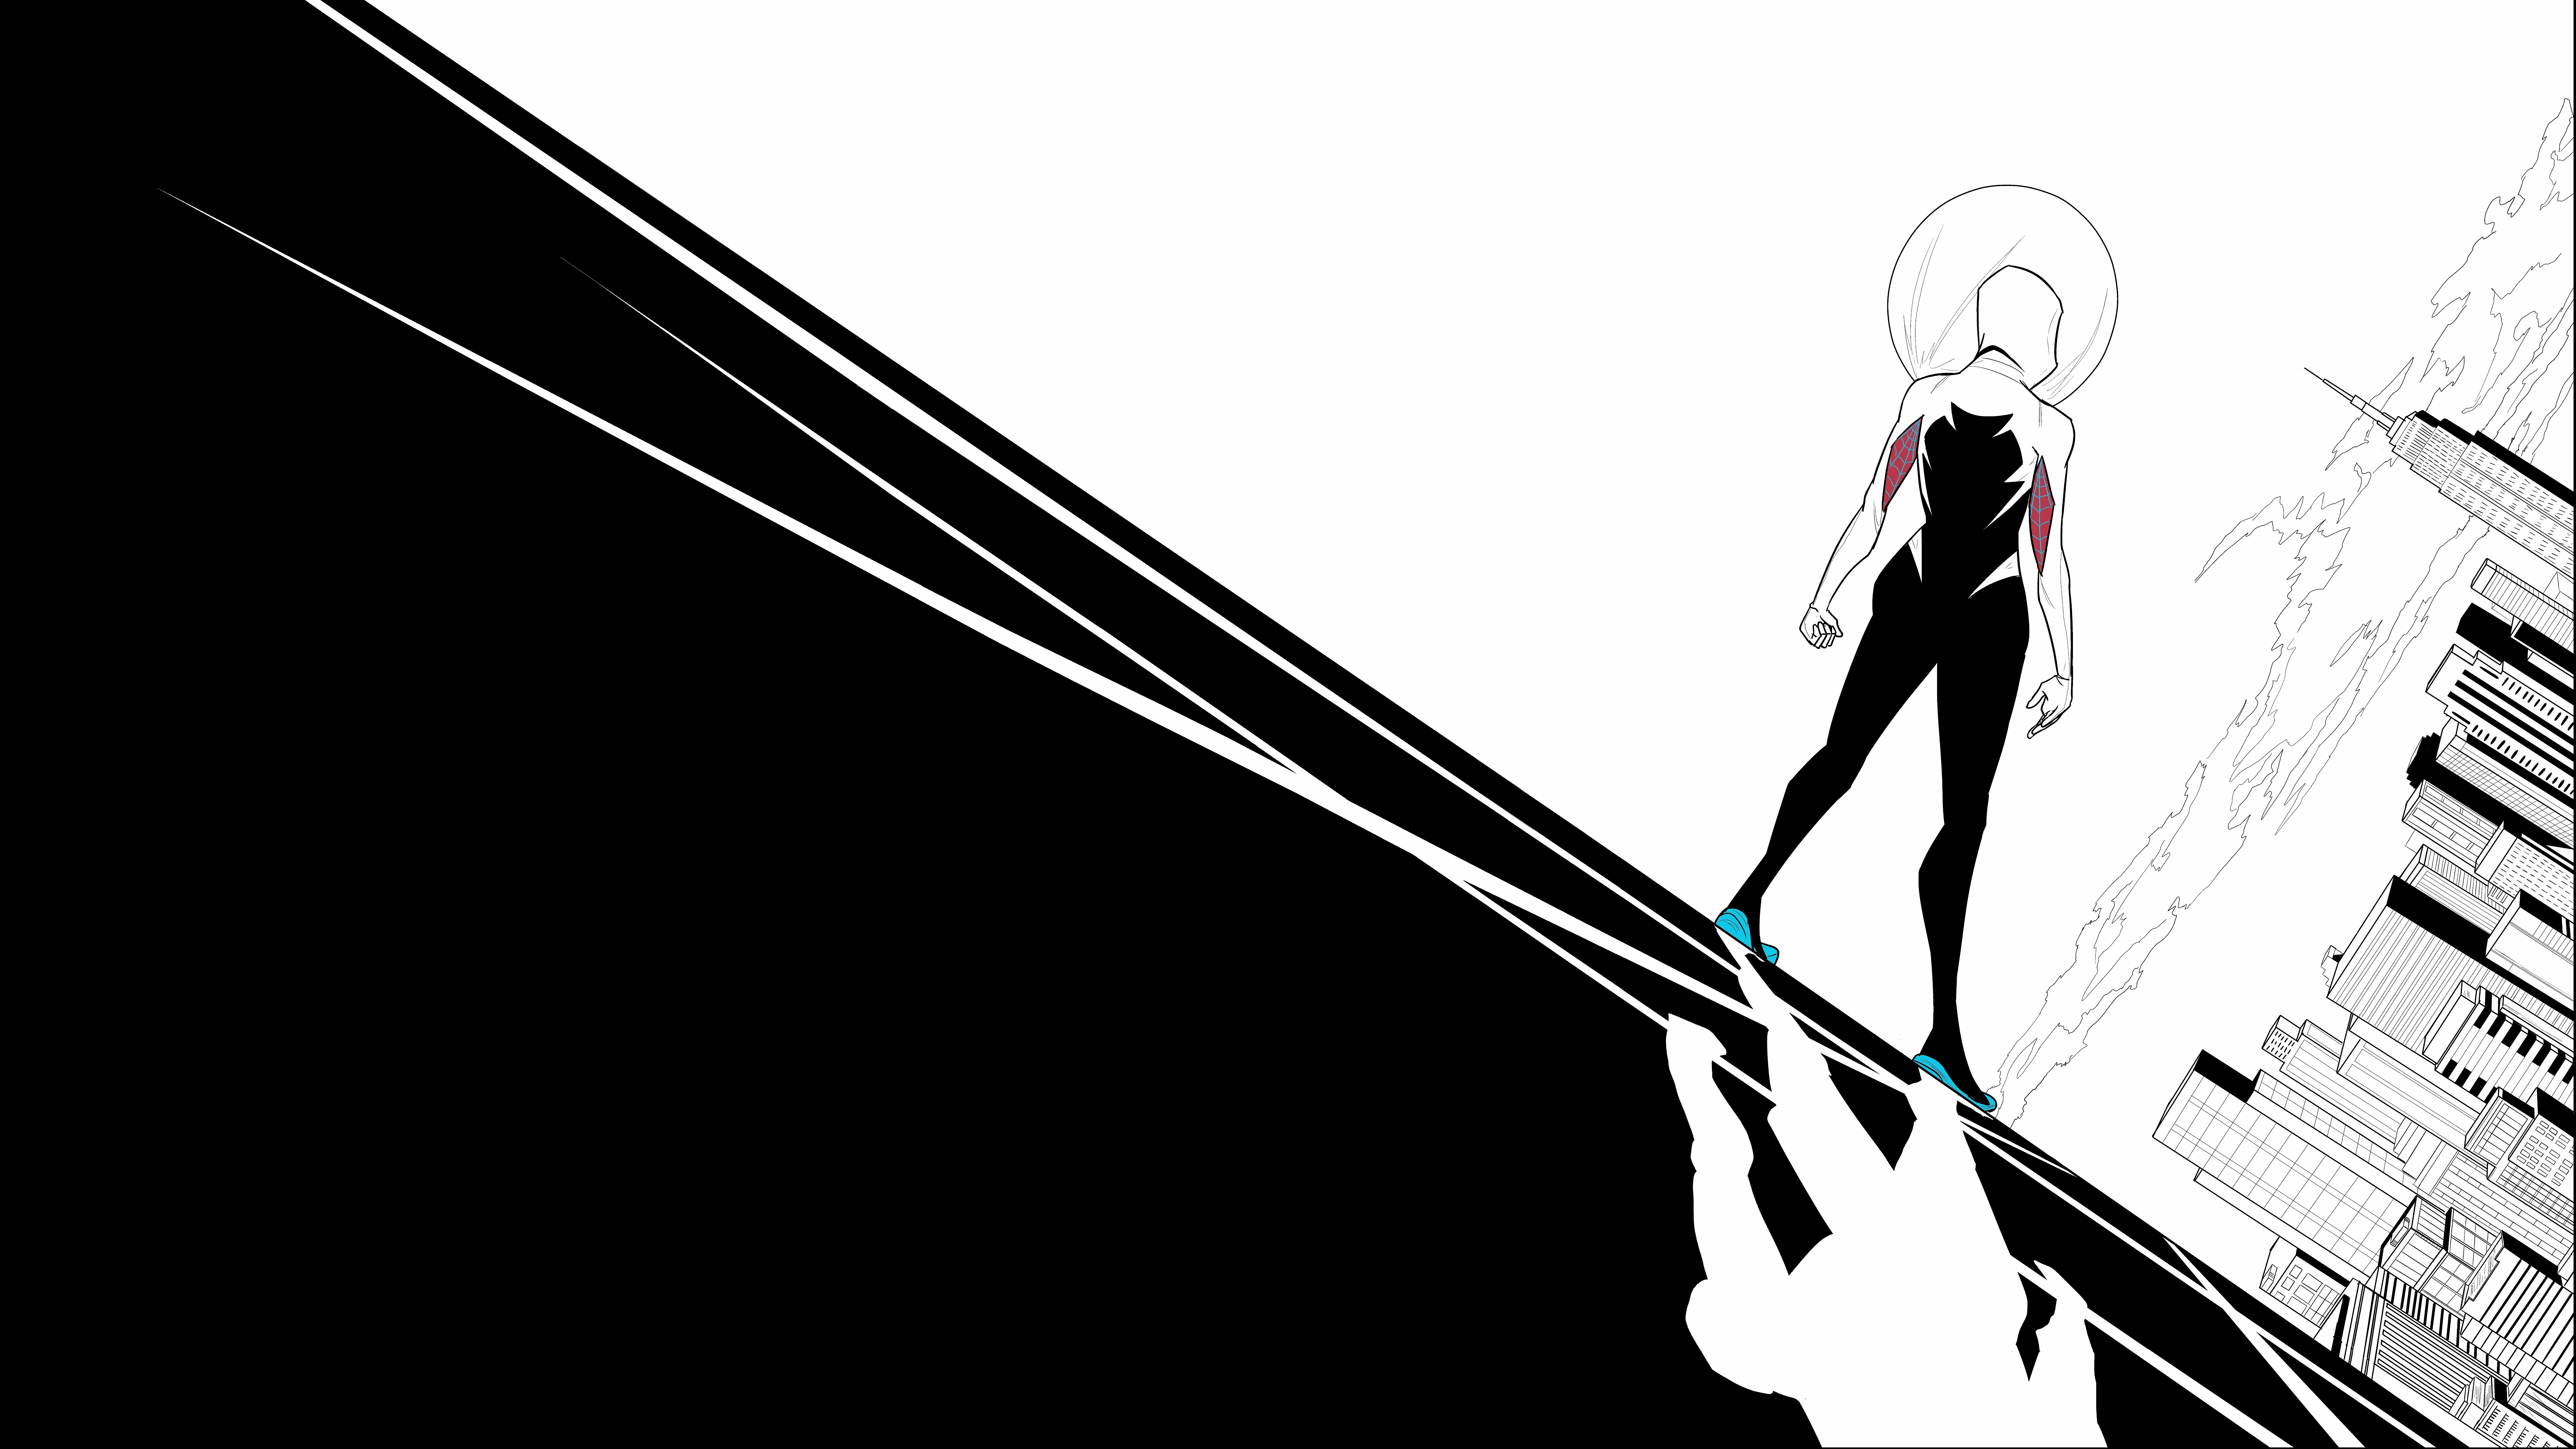 Spider-Gwen 8k Ultra HD Wallpaper | Background Image ...